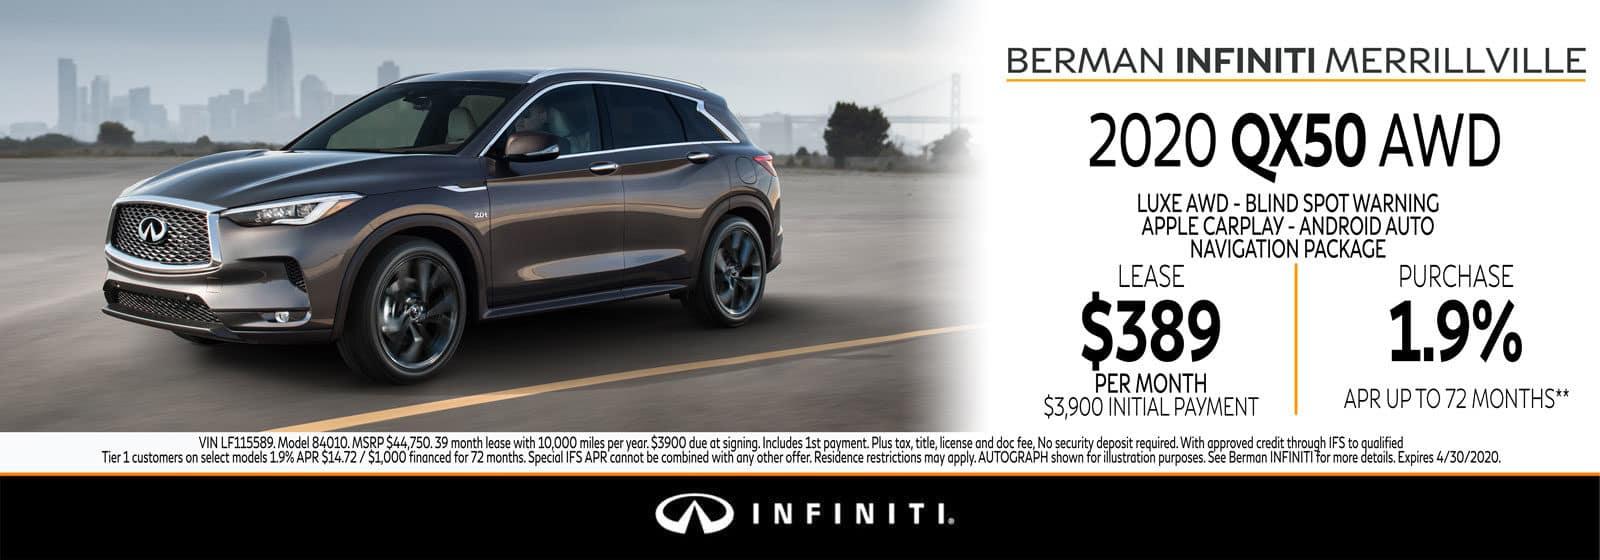 New 2020 INFINITI QX50 April Offer at Berman INFINITI of Merrillville!